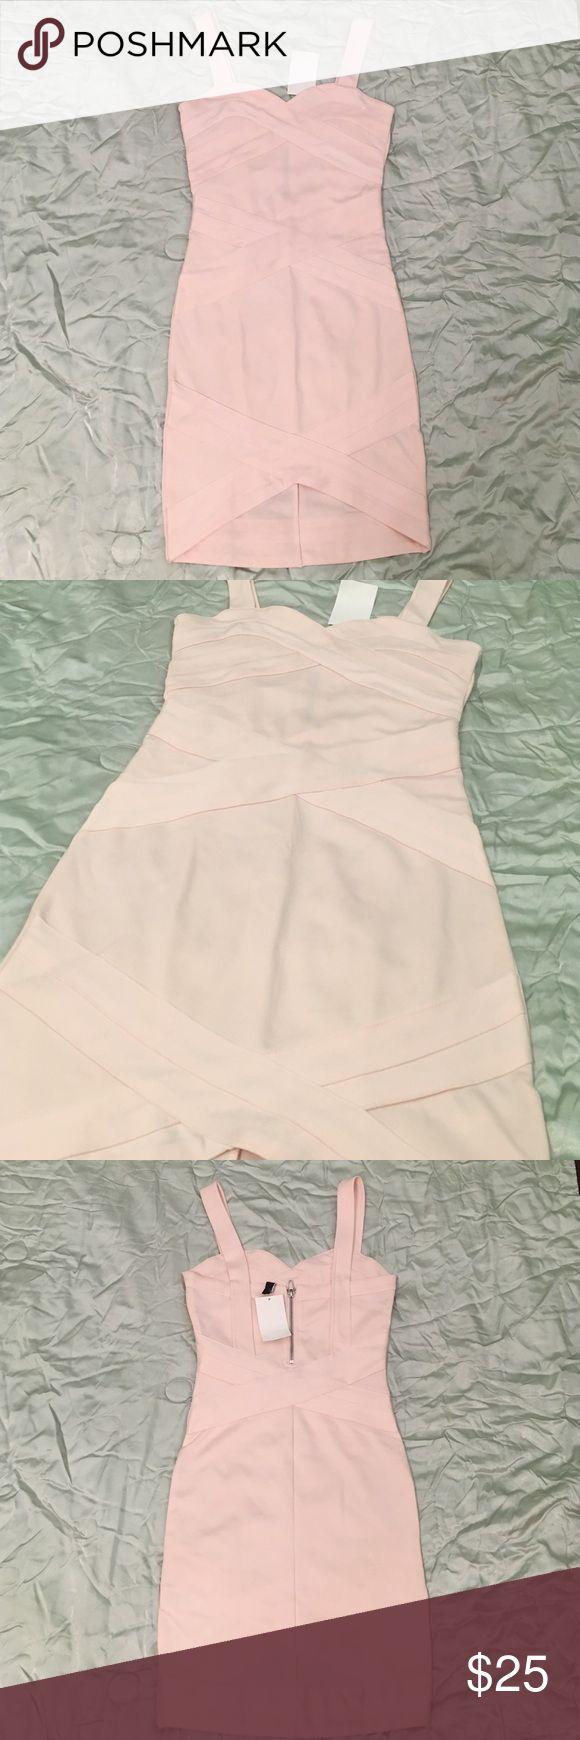 ✨NWT✨ H&M Light Pink Bandage Dress H&M Light Pink Bandage Dress. Super form fitting and great quality!! NWT! H&M Dresses Mini